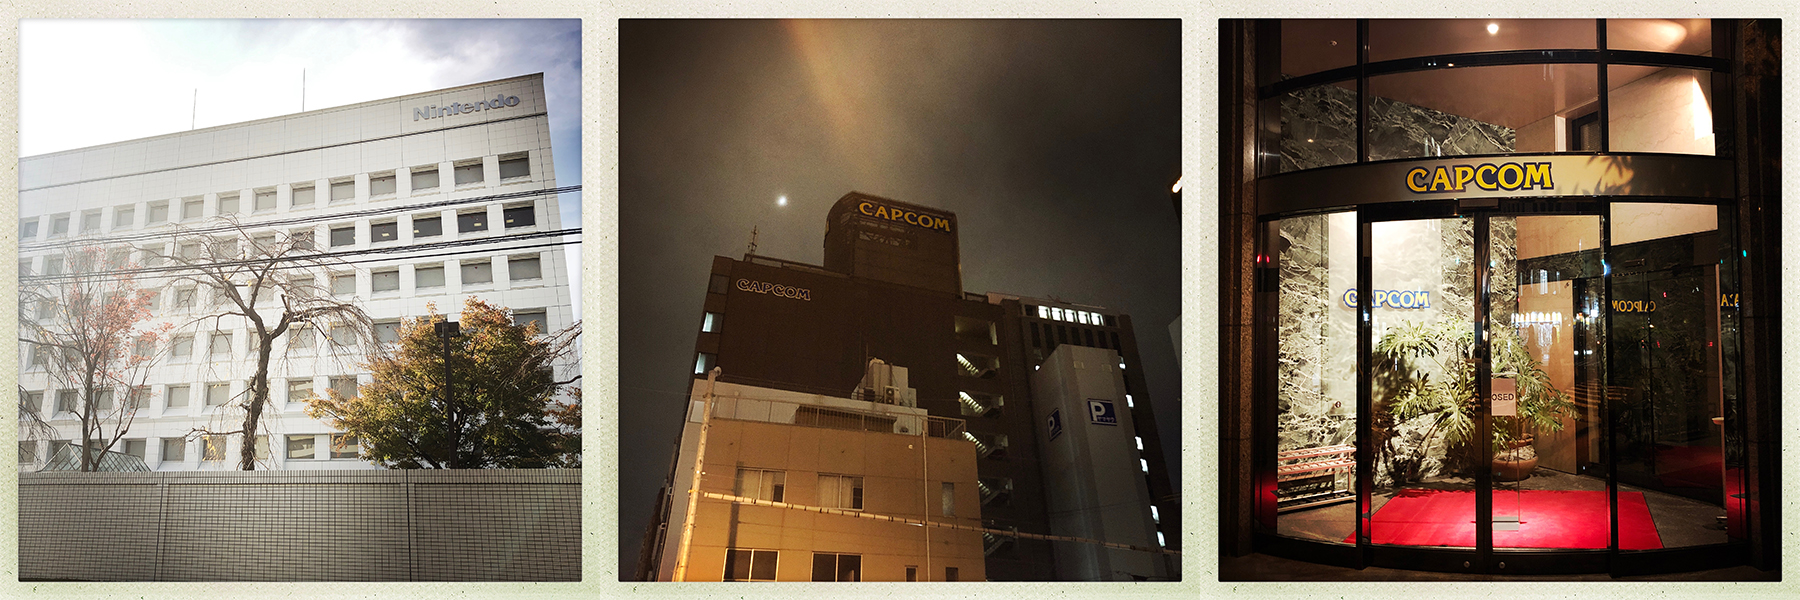 nintendo_hq_kyoto_capcom_hq_osaka.jpg